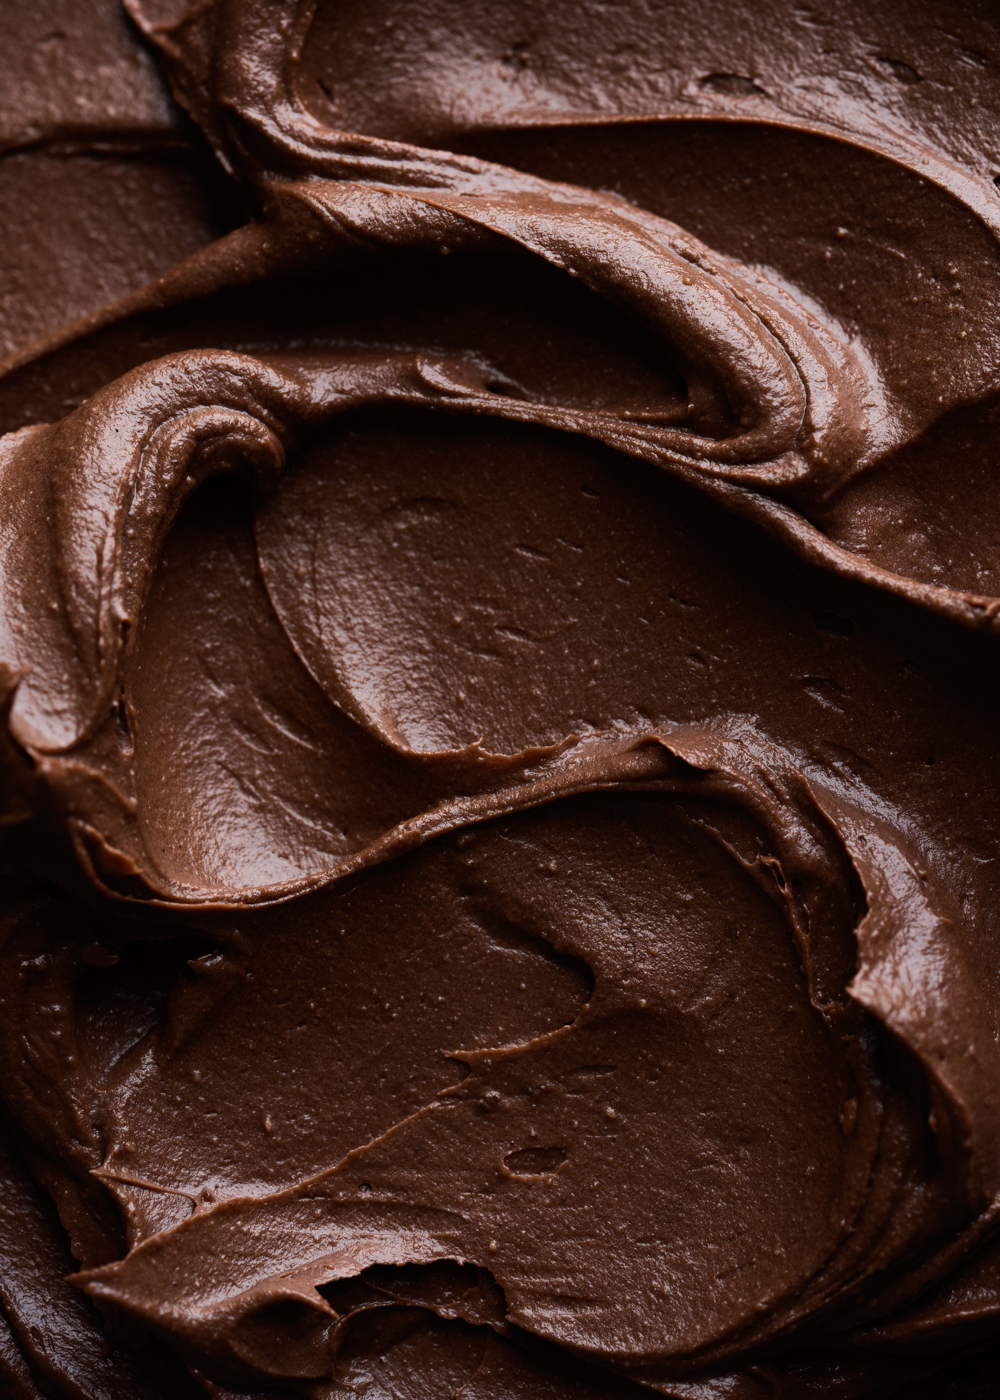 Chocolate0290-Editar.jpg